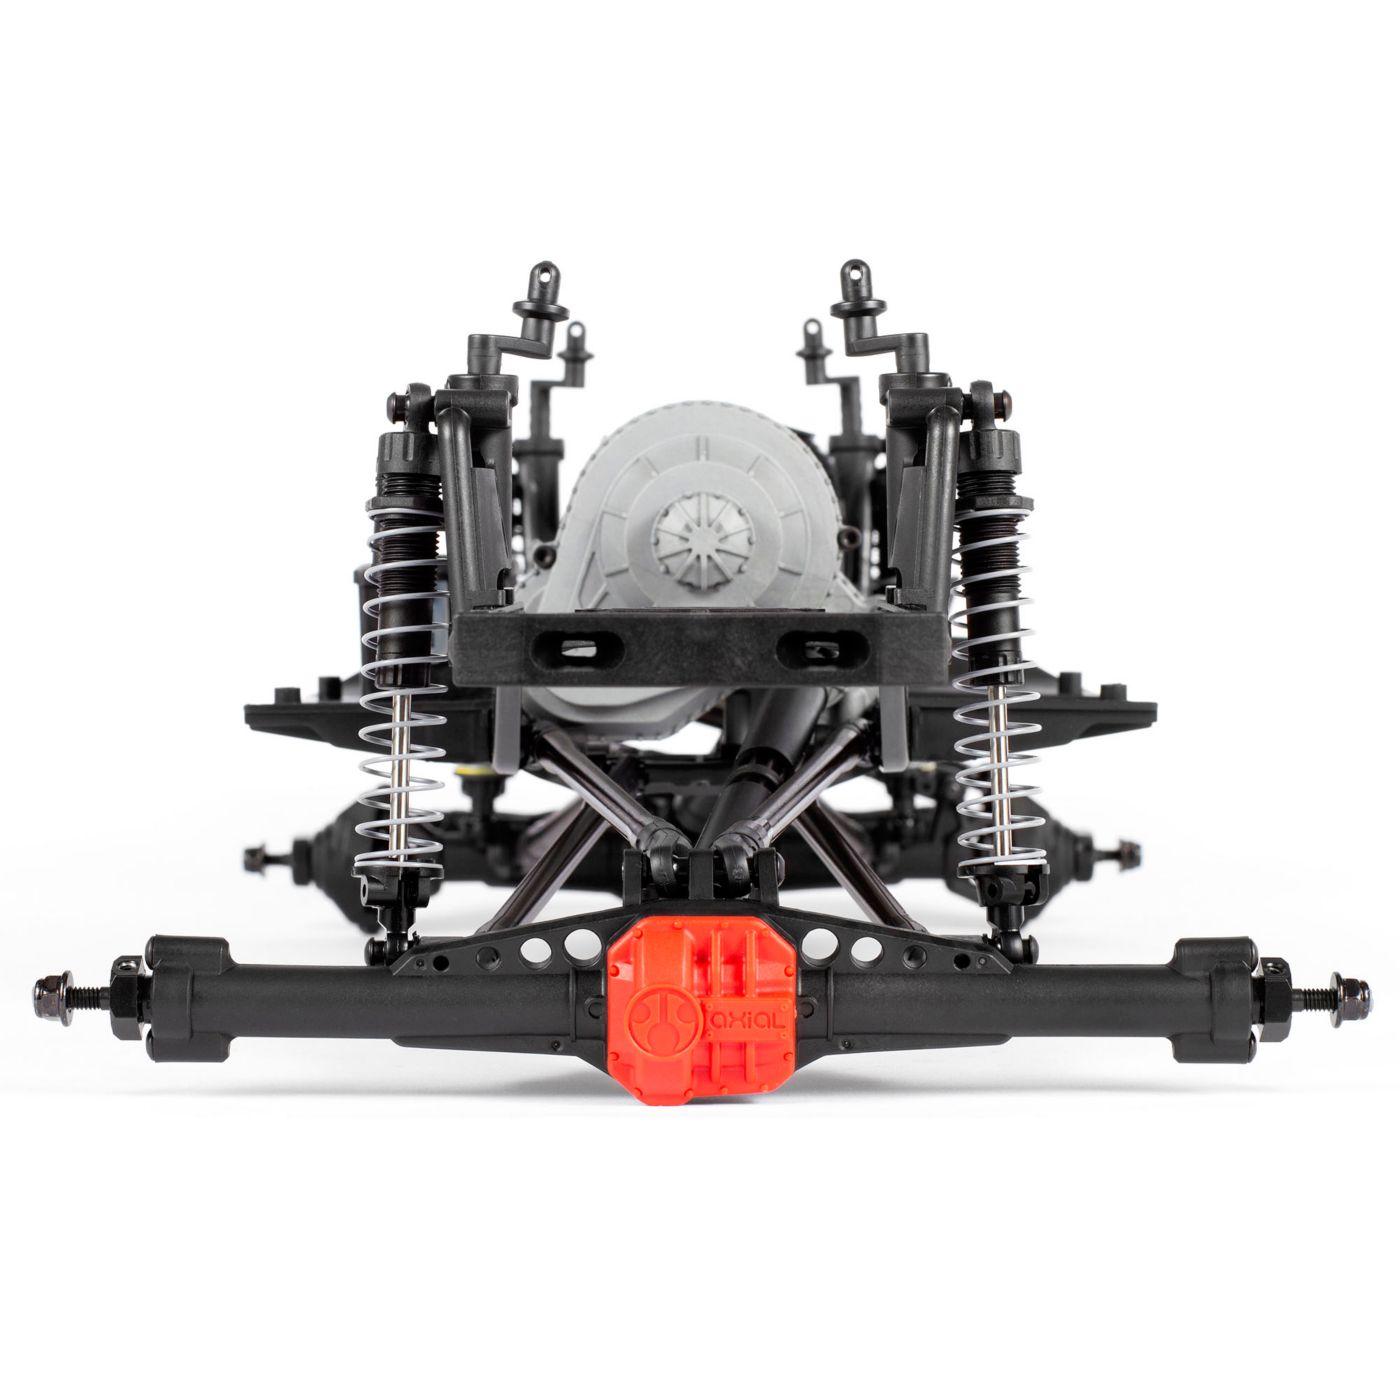 Axial Scx 10 II raw builders kit 1/10 03